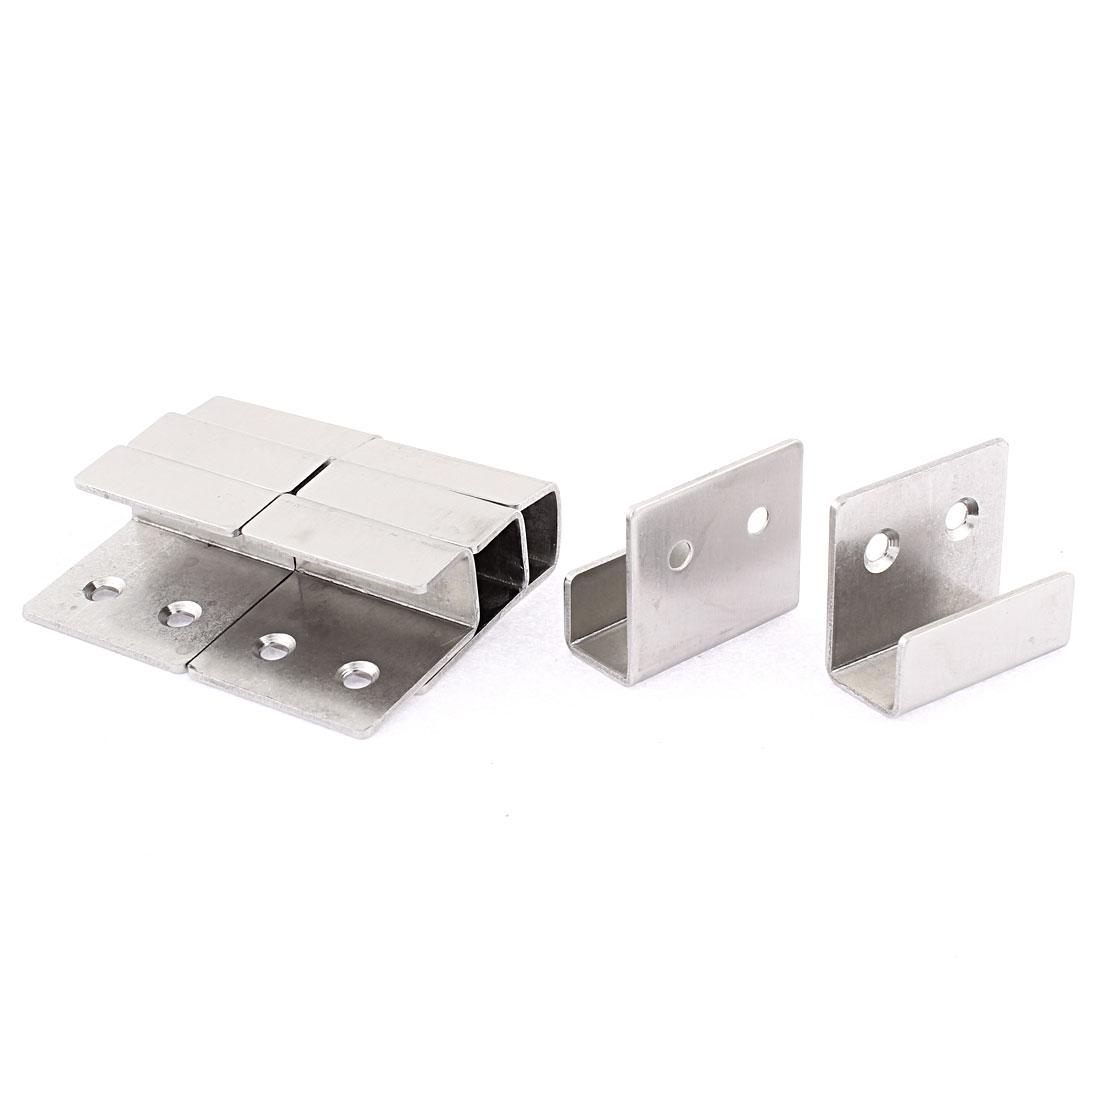 Stainless Steel Wall Bracket Hook Hanger 8pcs for Ceramic Tile Display